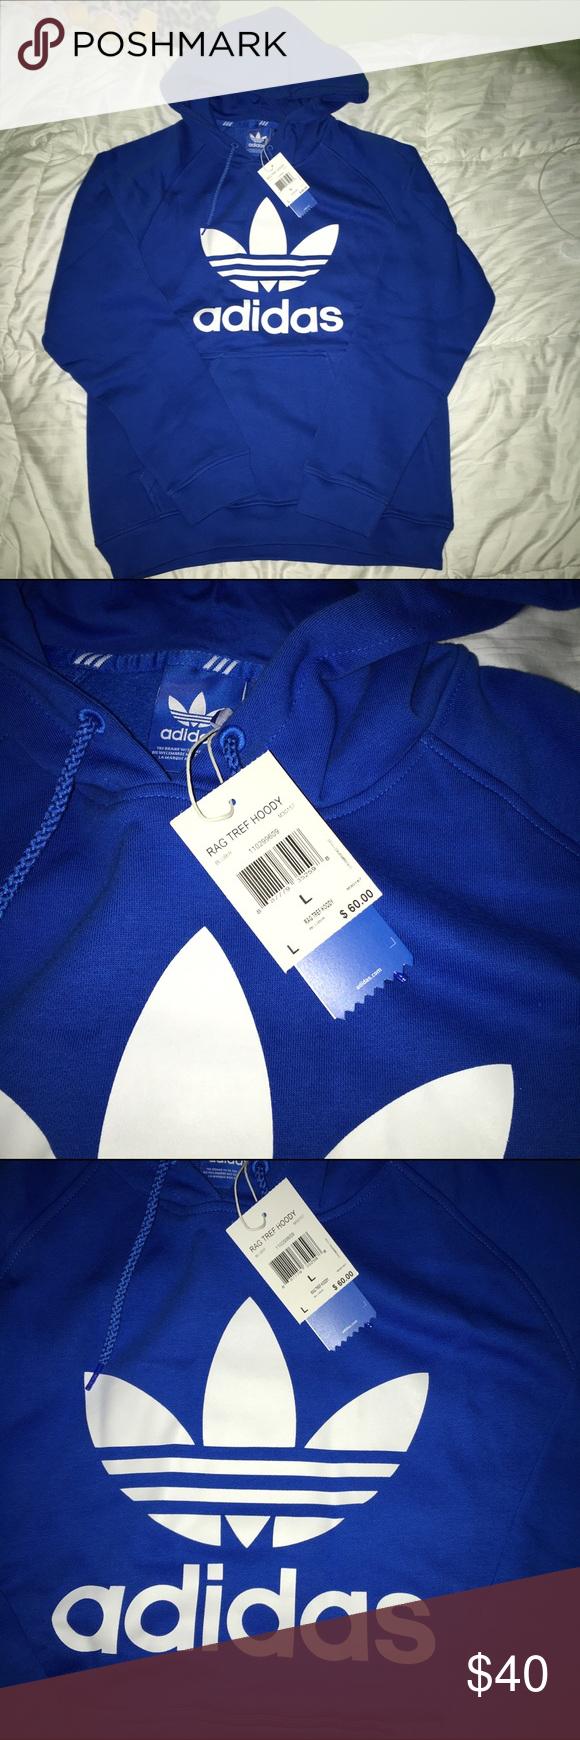 Adidas Originals Men S Hoodie Size Large Hoodies Men Adidas Originals Mens Hoodies [ 1740 x 580 Pixel ]